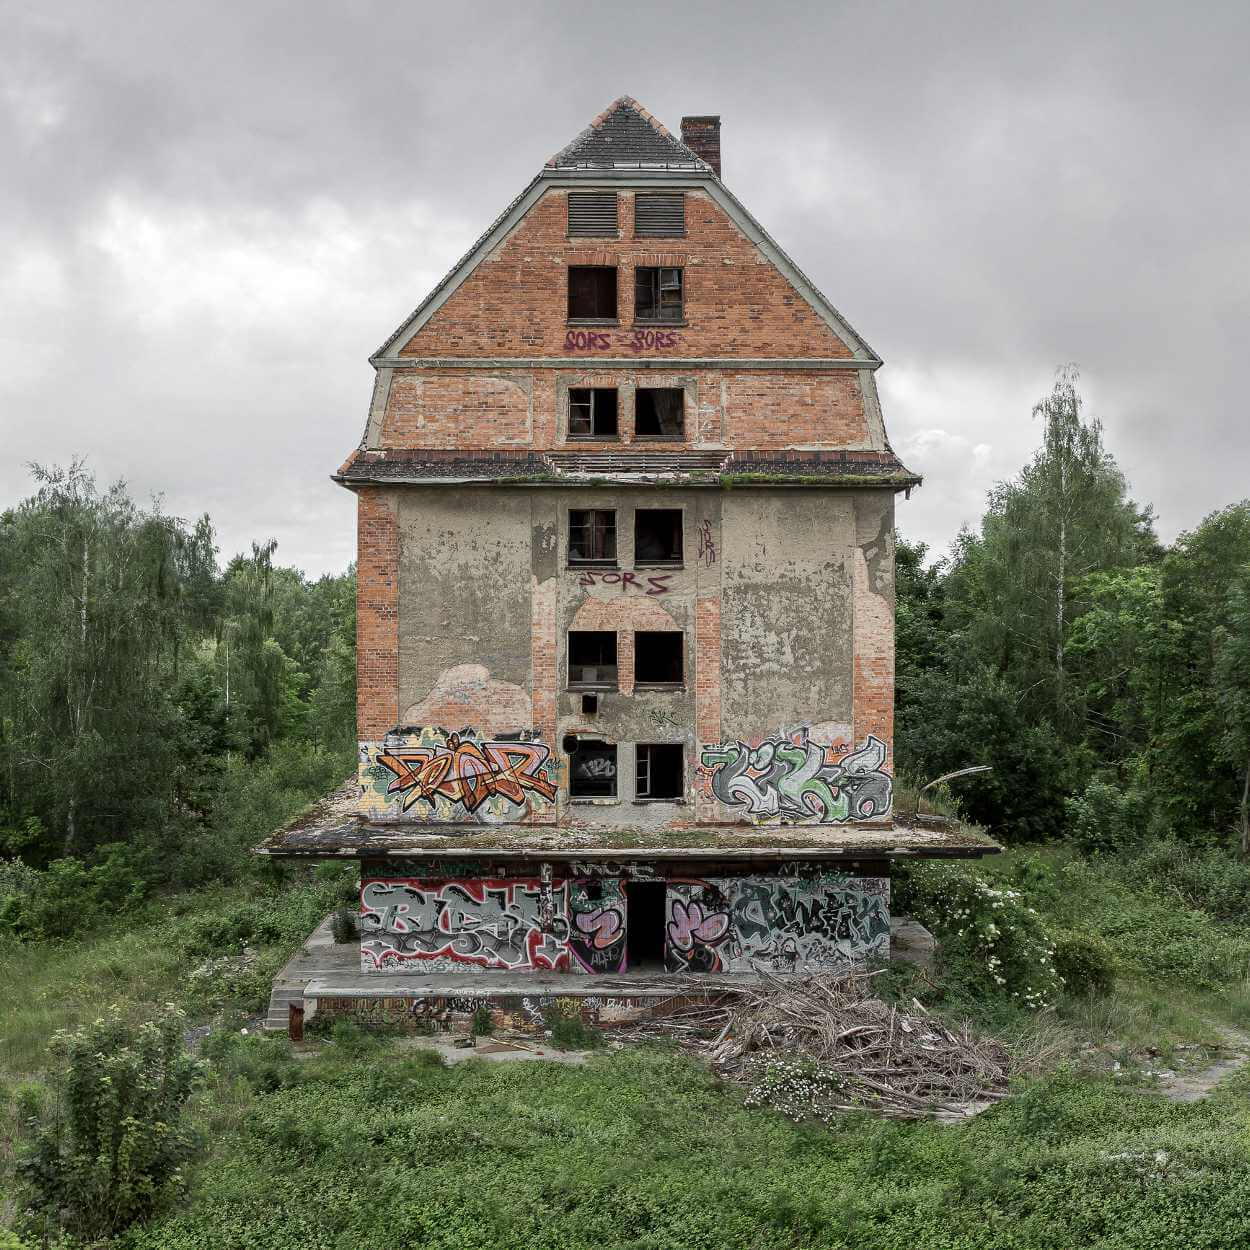 Leerstehendes Gebäude in Leipzig Gohlis